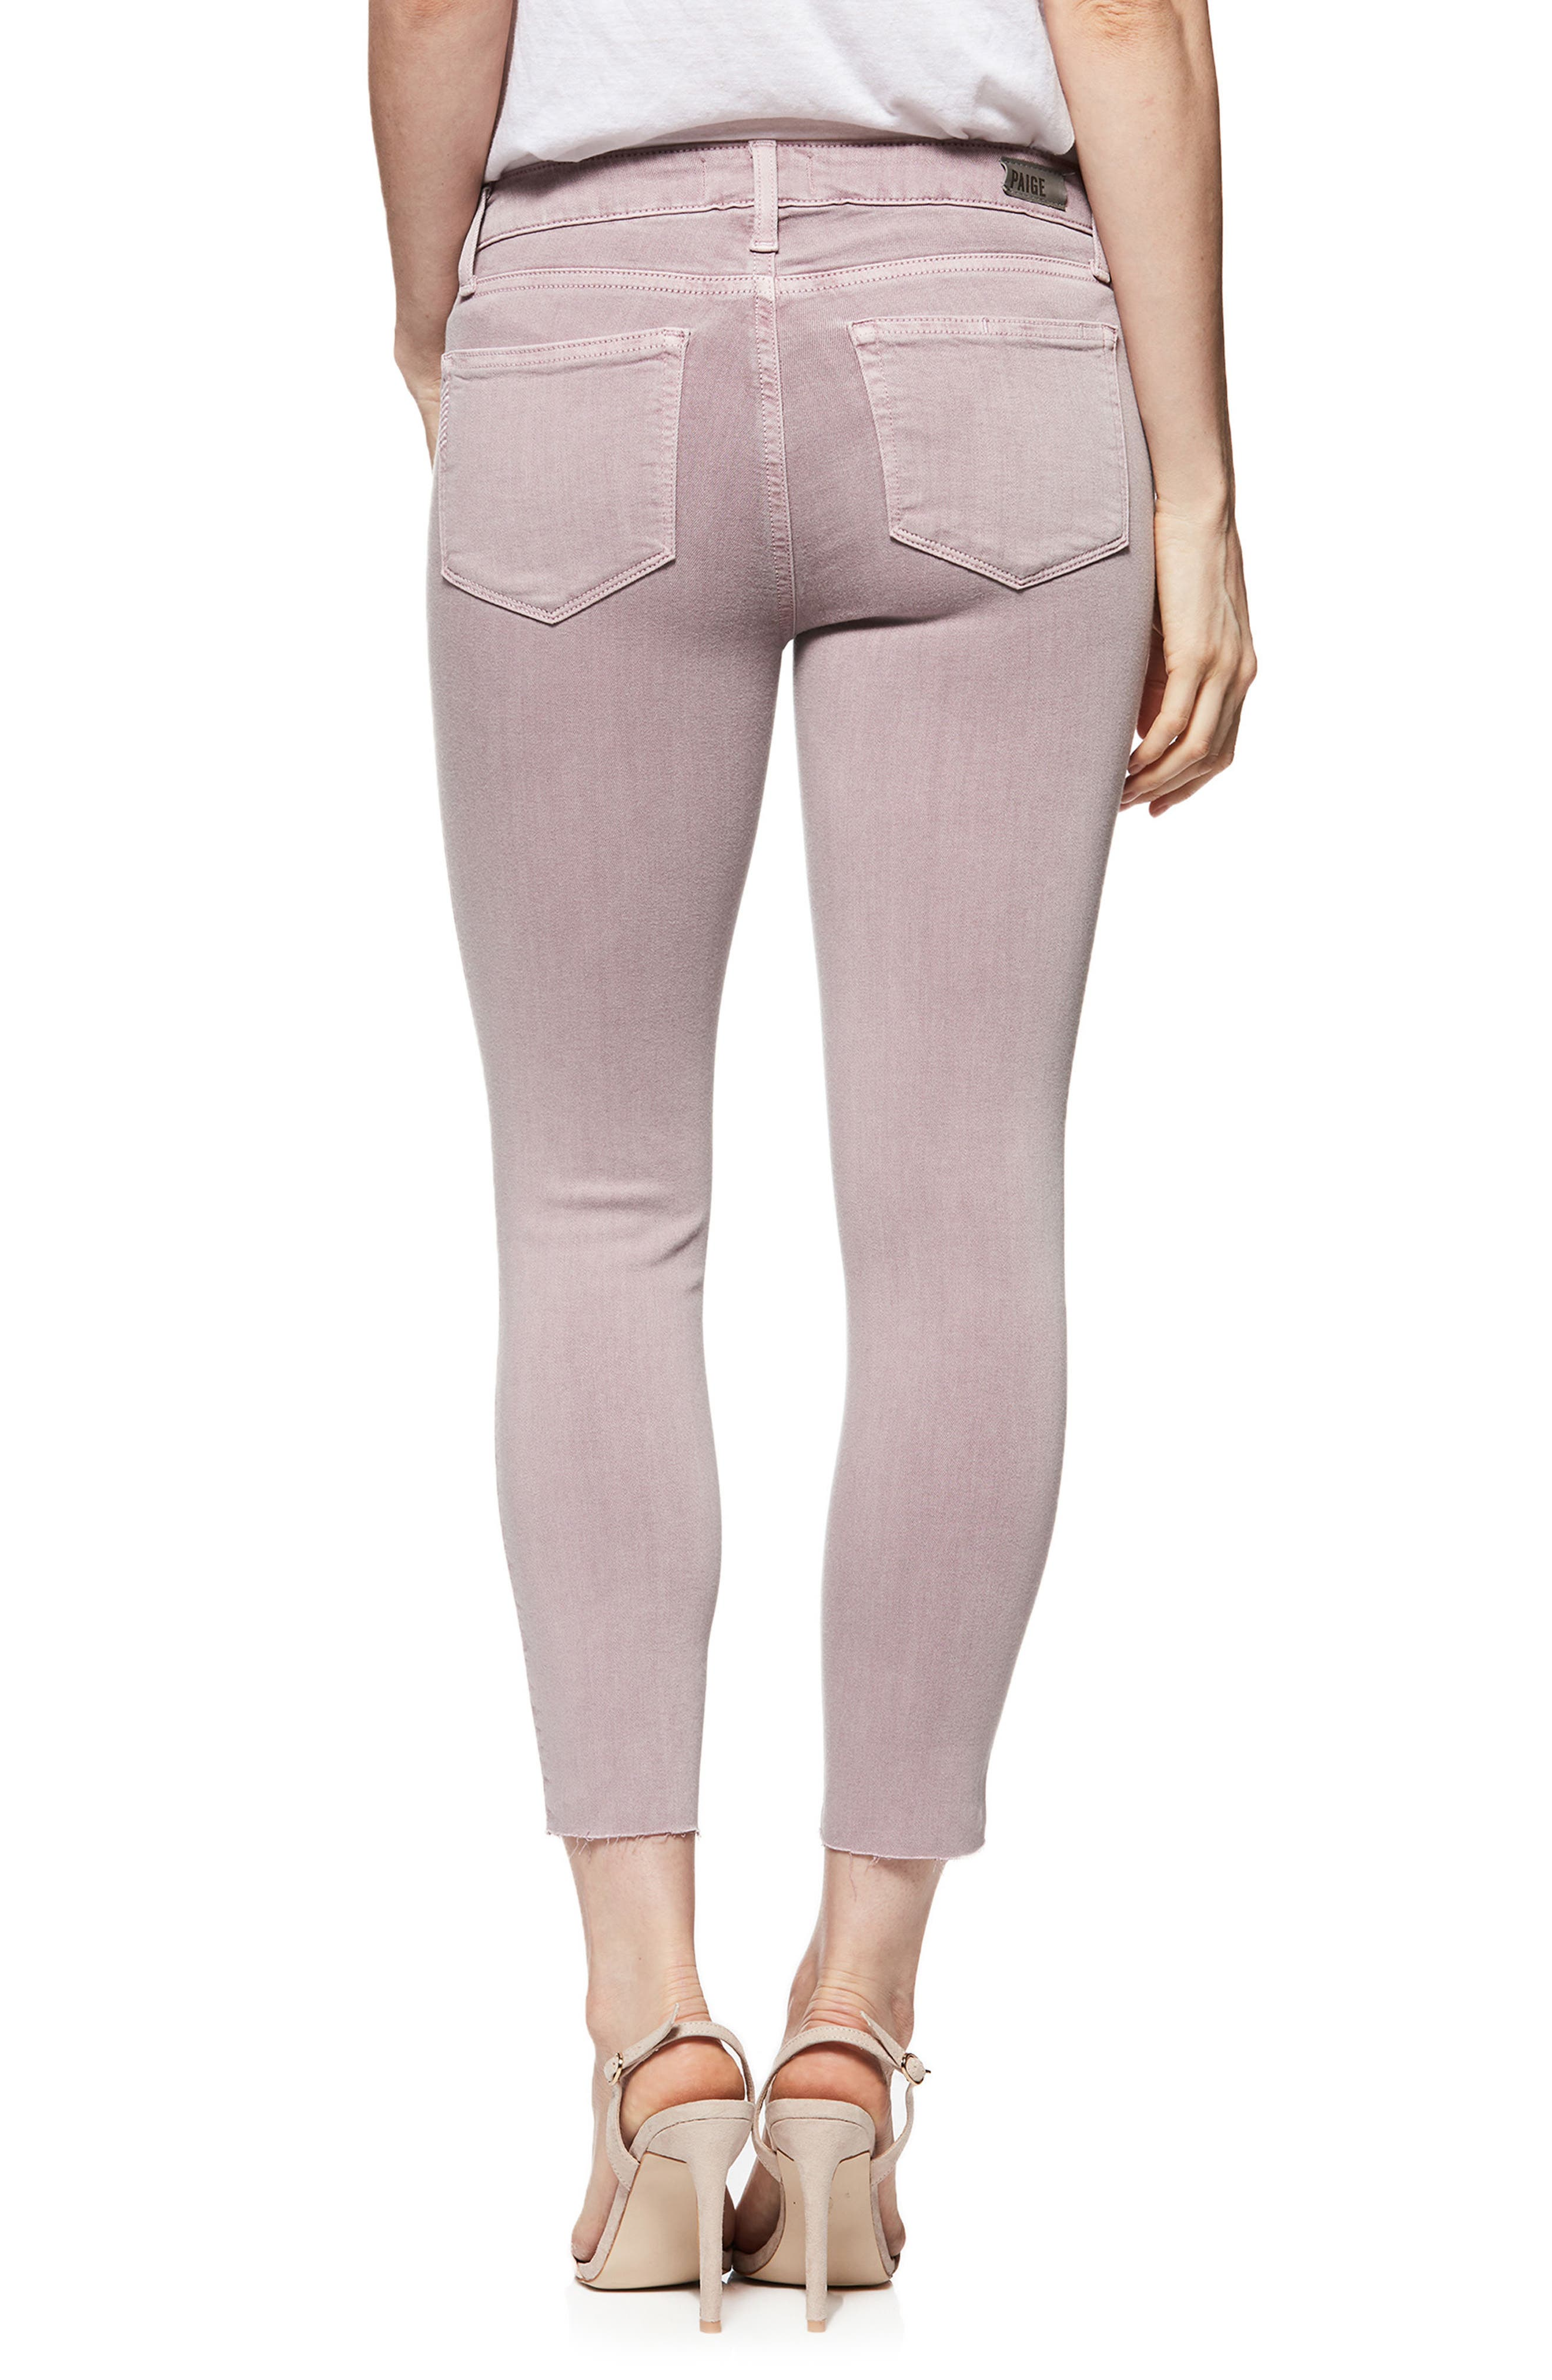 Transcend - Verdugo Raw Hem Crop Skinny Jeans,                             Alternate thumbnail 2, color,                             Vintage Lavendar Blooms